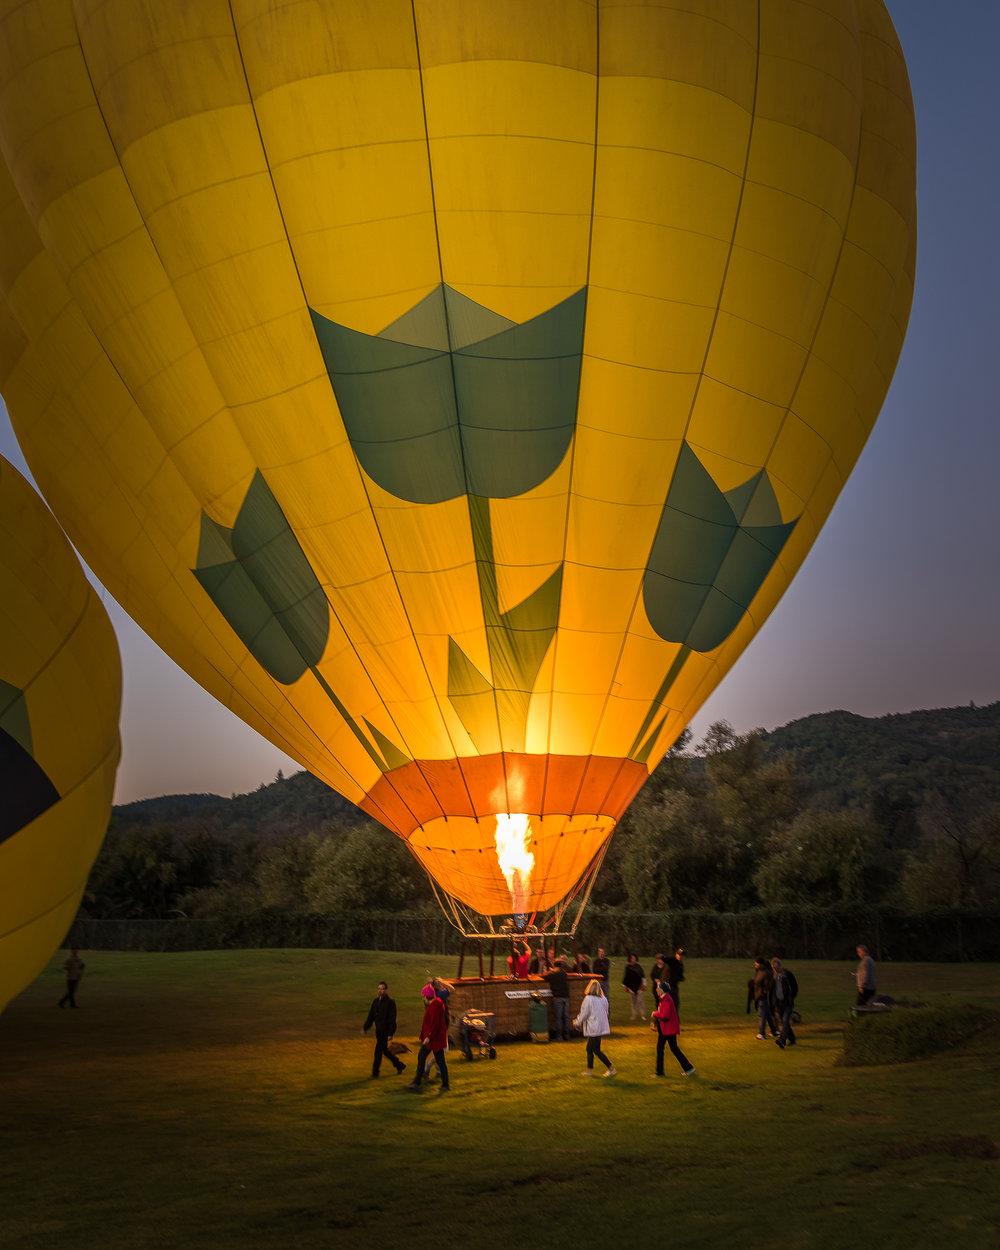 NAPA-Baloon-9.jpg